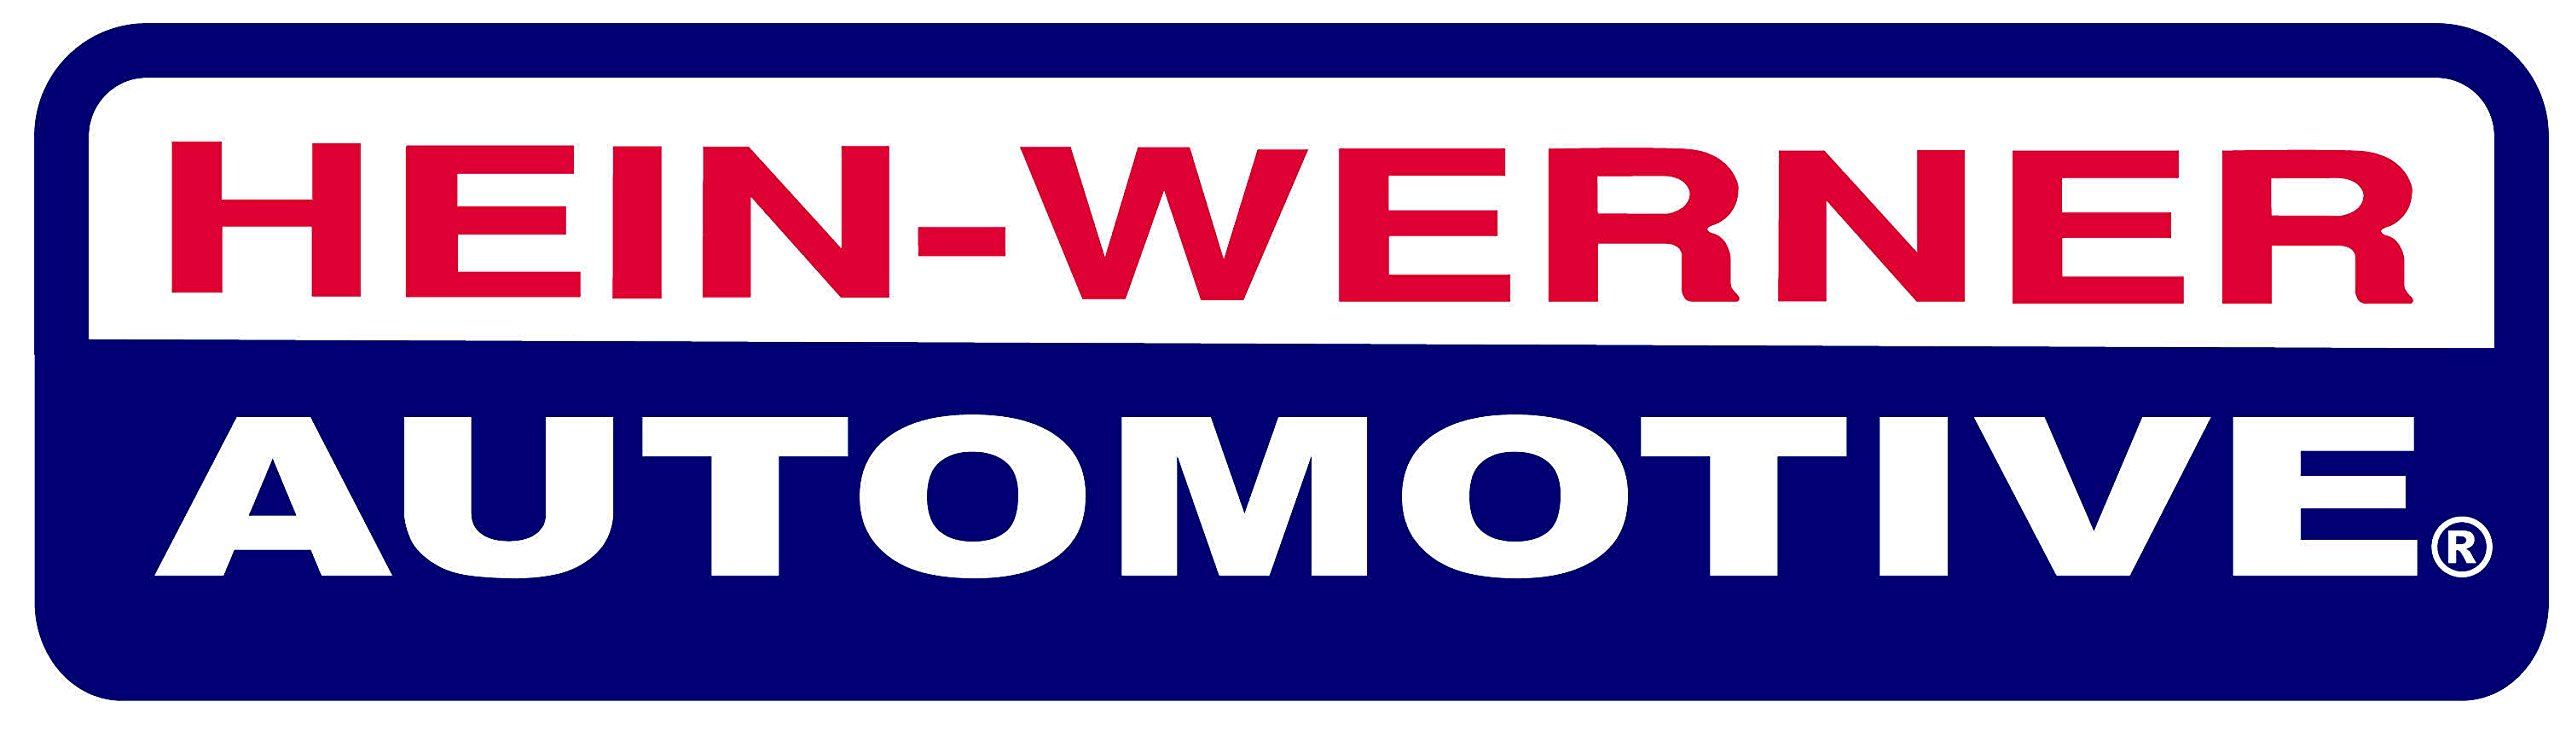 Hein-Warner Automotive Oil, HYD Jack Premium 1 Gal (Hw93294)